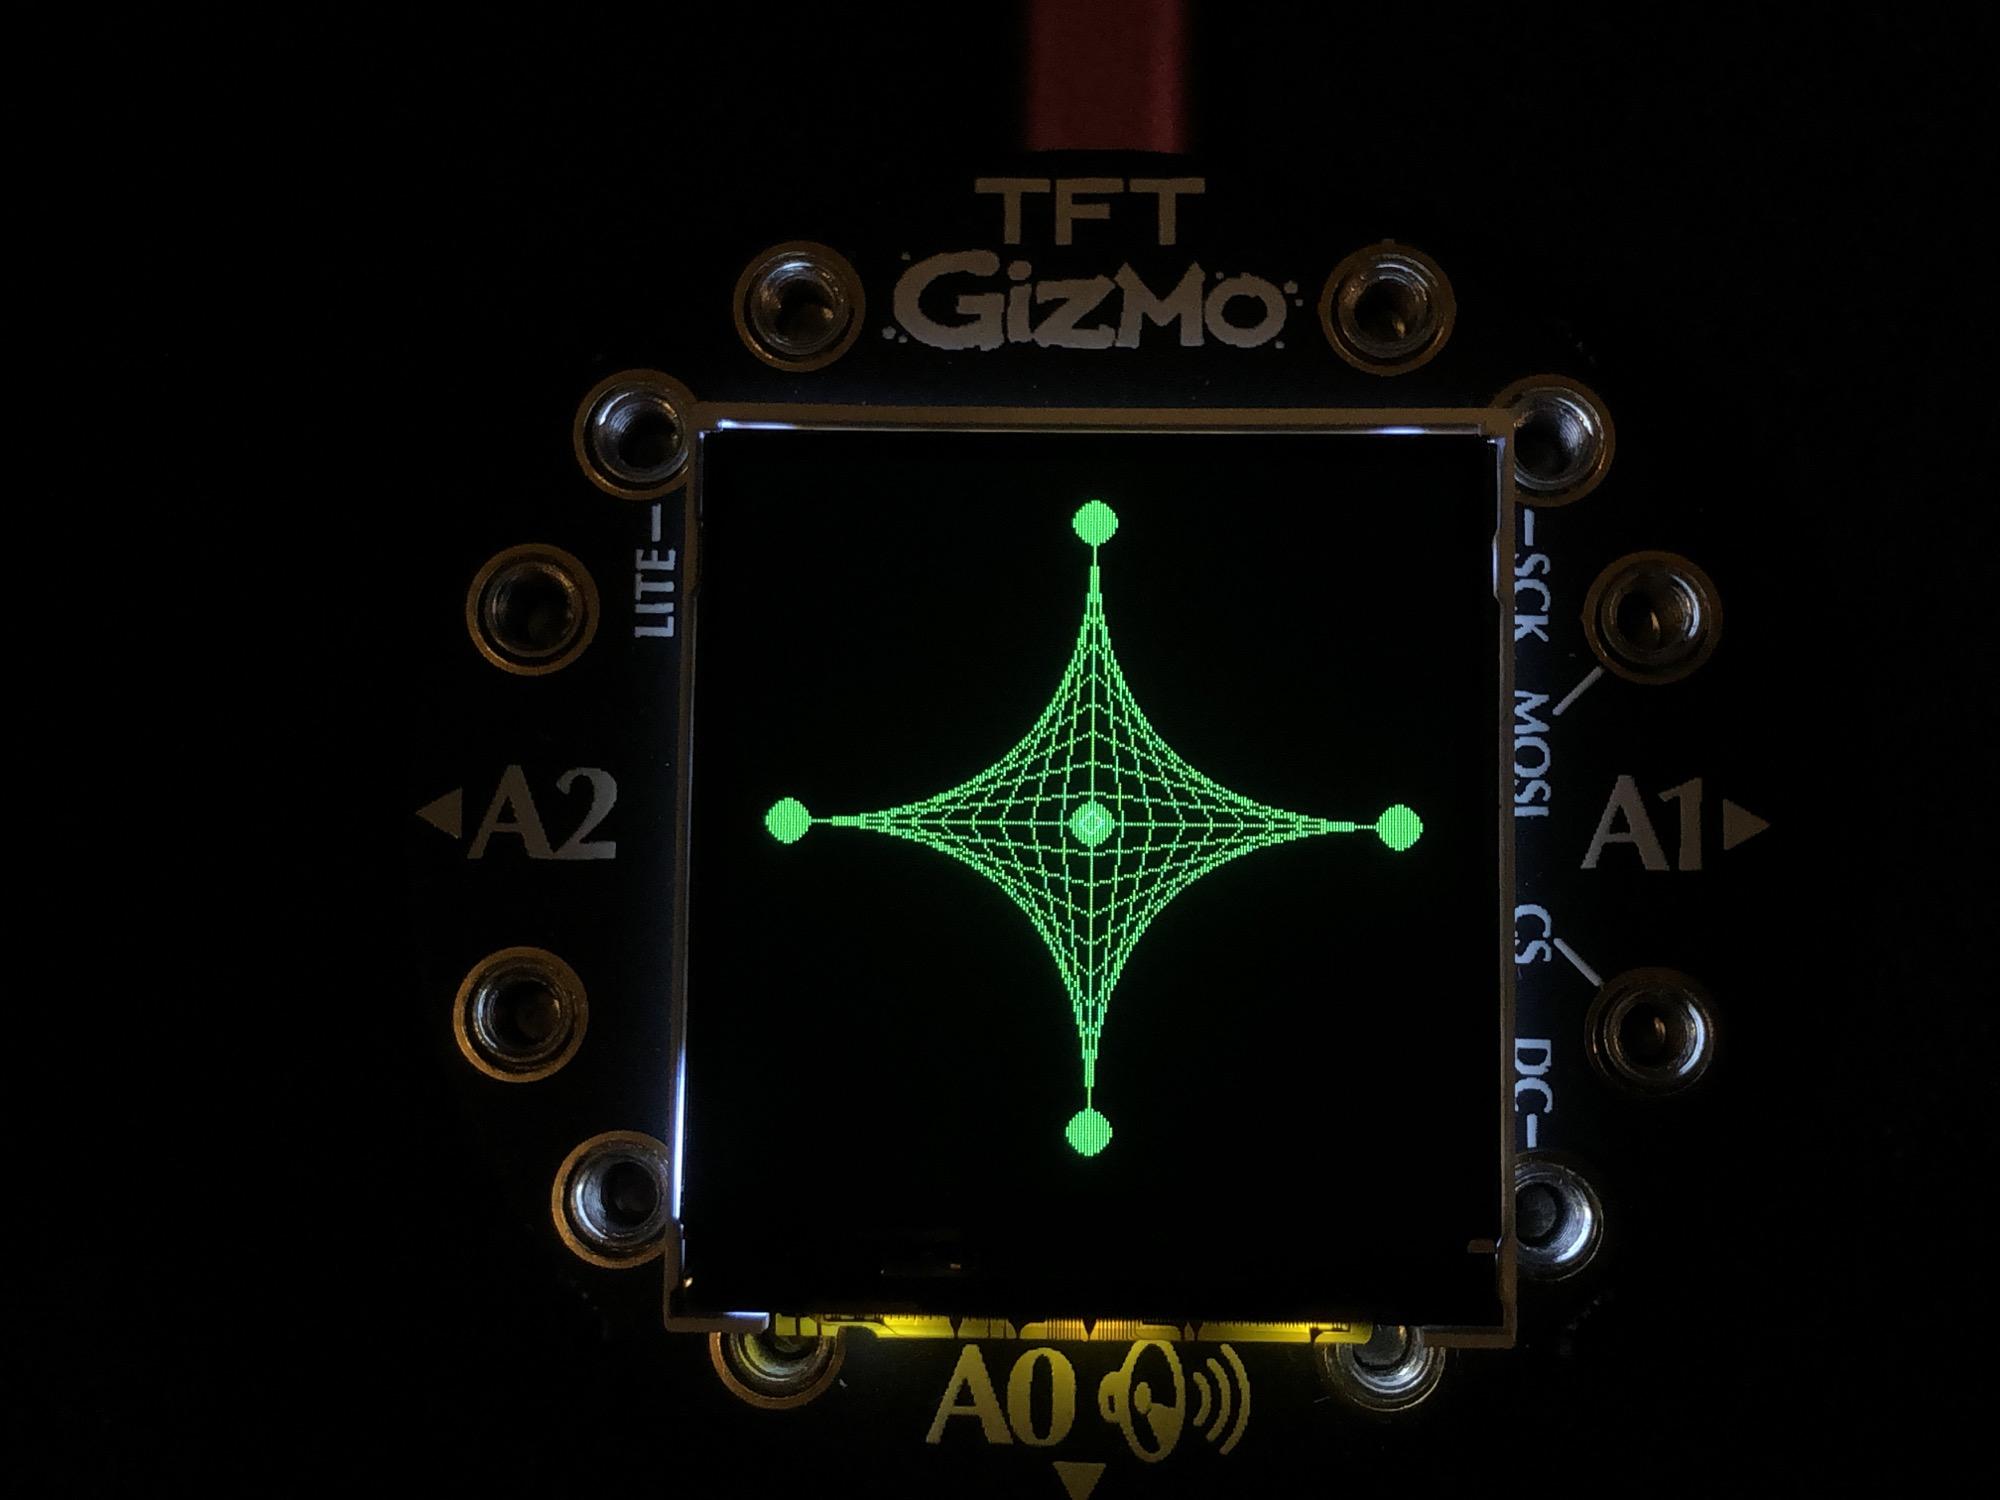 circuitpython_turtle_gizmo_9169.jpg